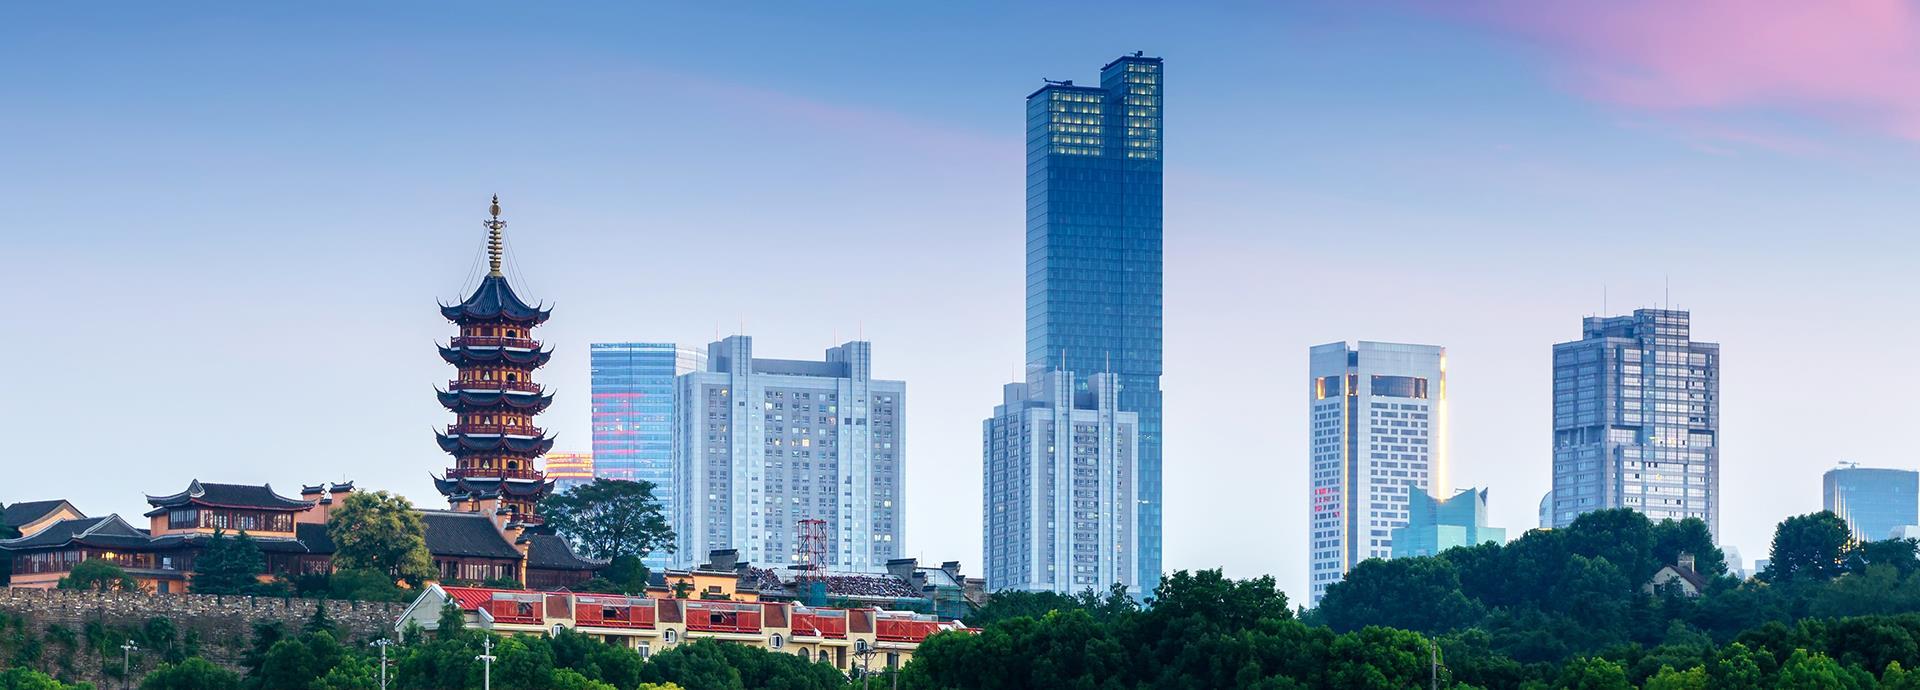 The path towards a future of high renewable energy in Jiangsu, China